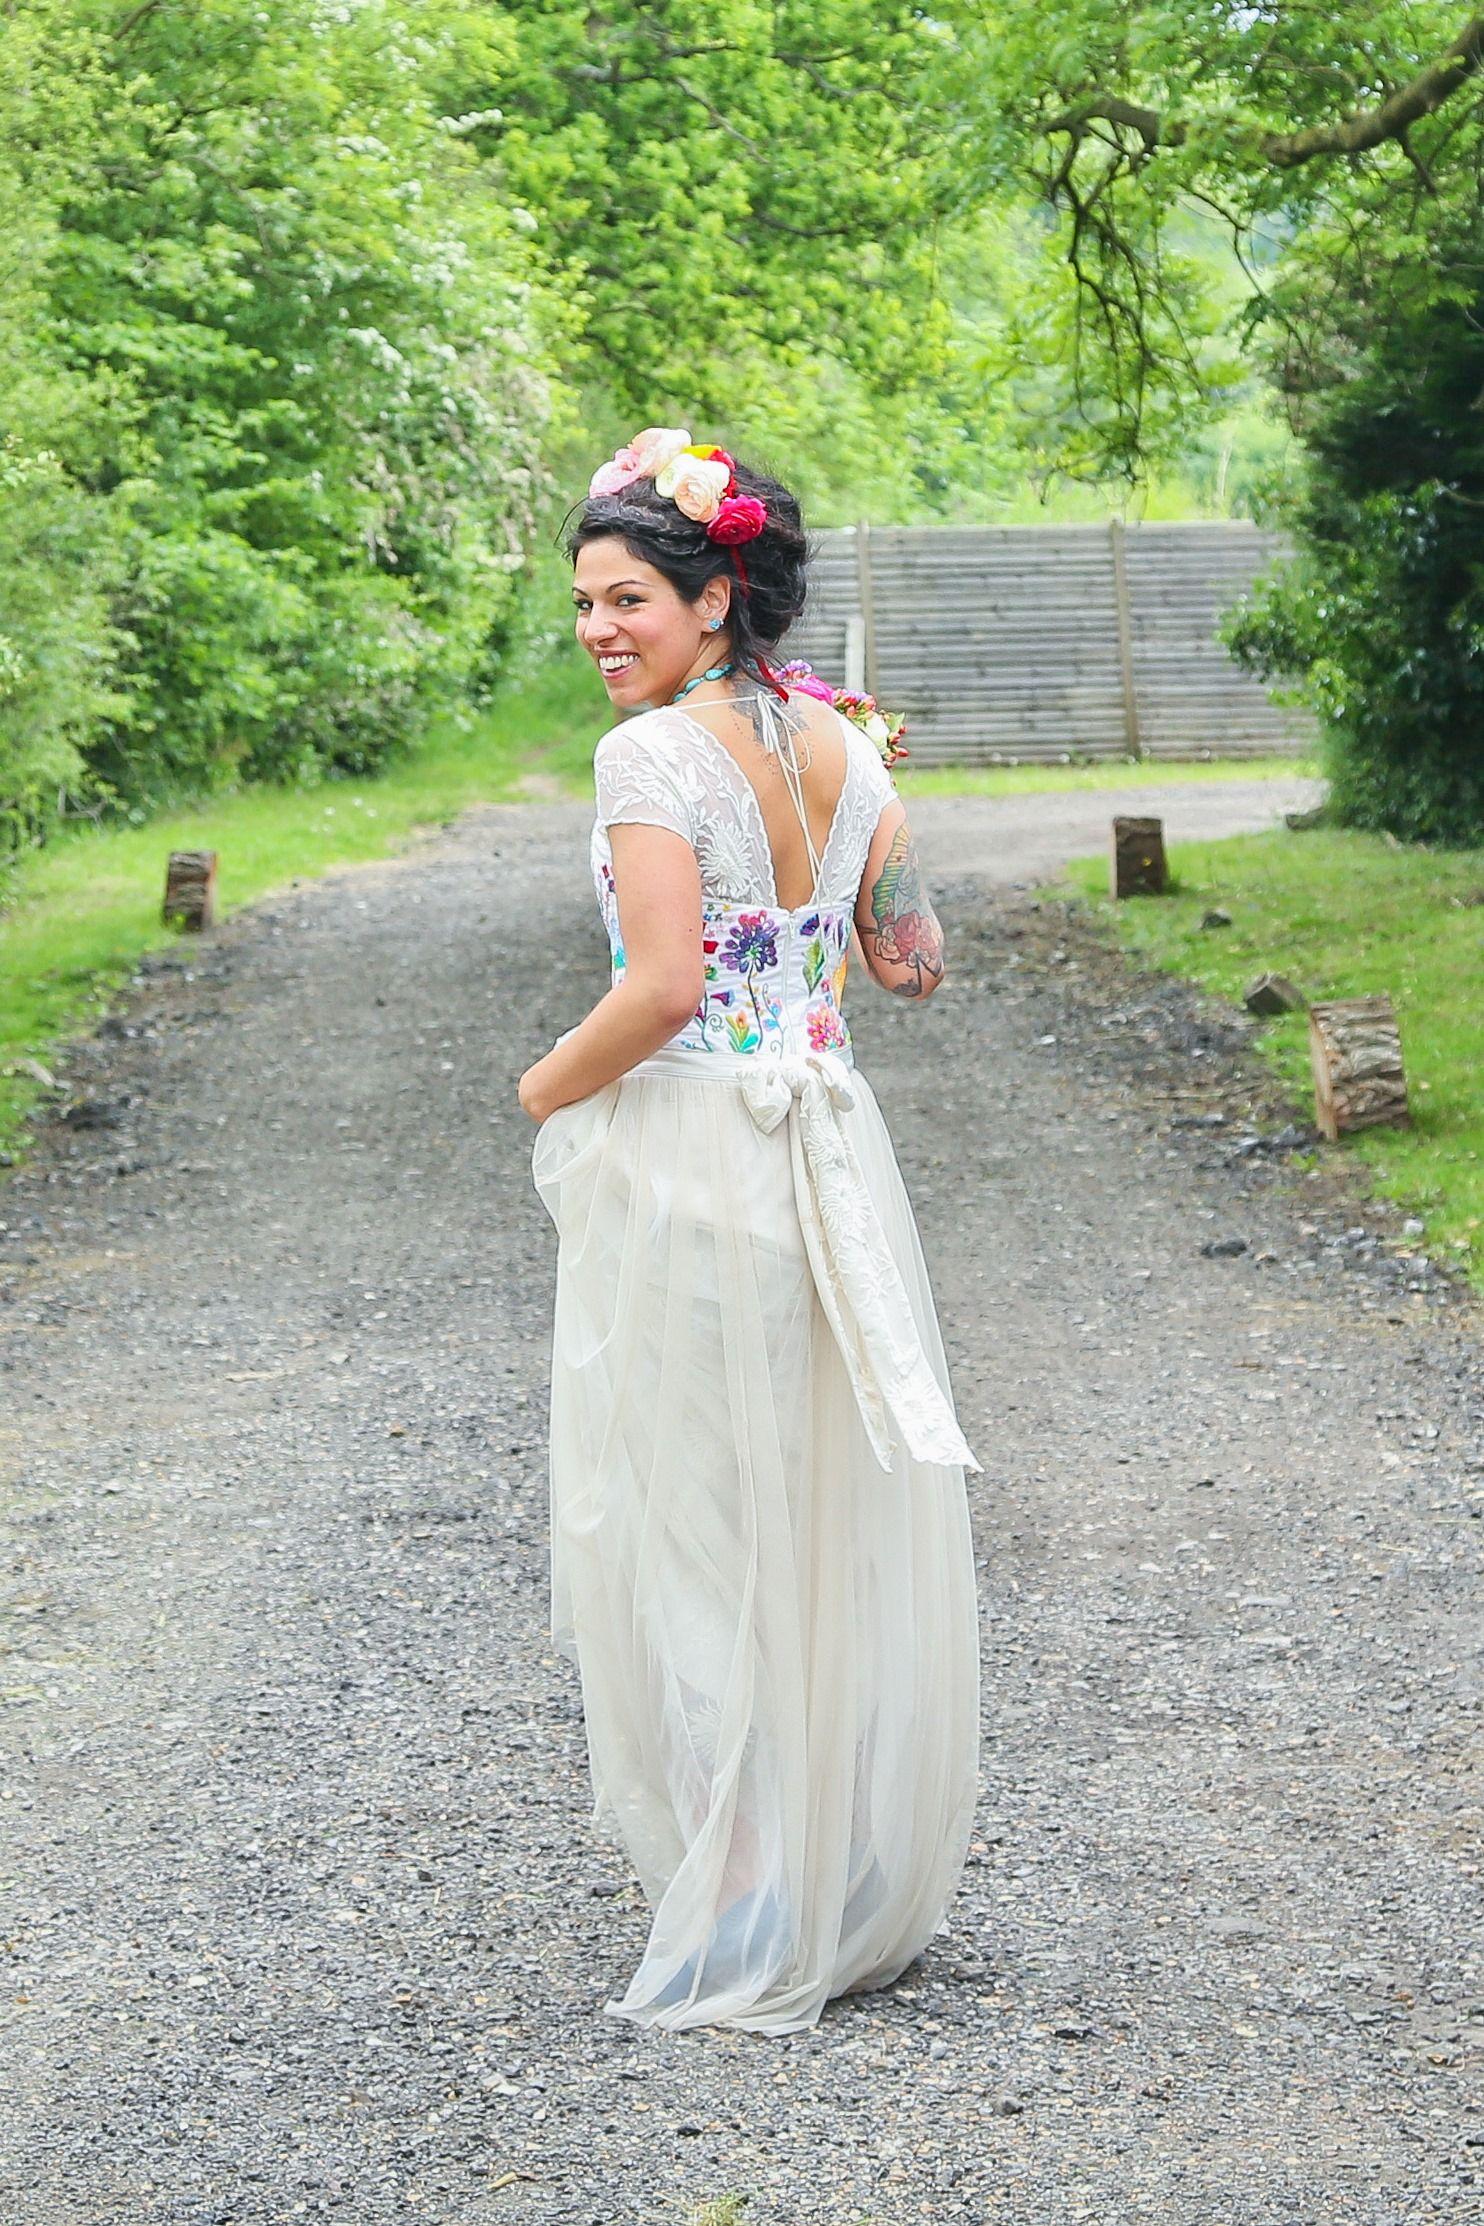 handmade wedding dresses Mexican folk flowers Frida Kahlo inspired wedding dress handmade wedding dress wedding dreadlocks